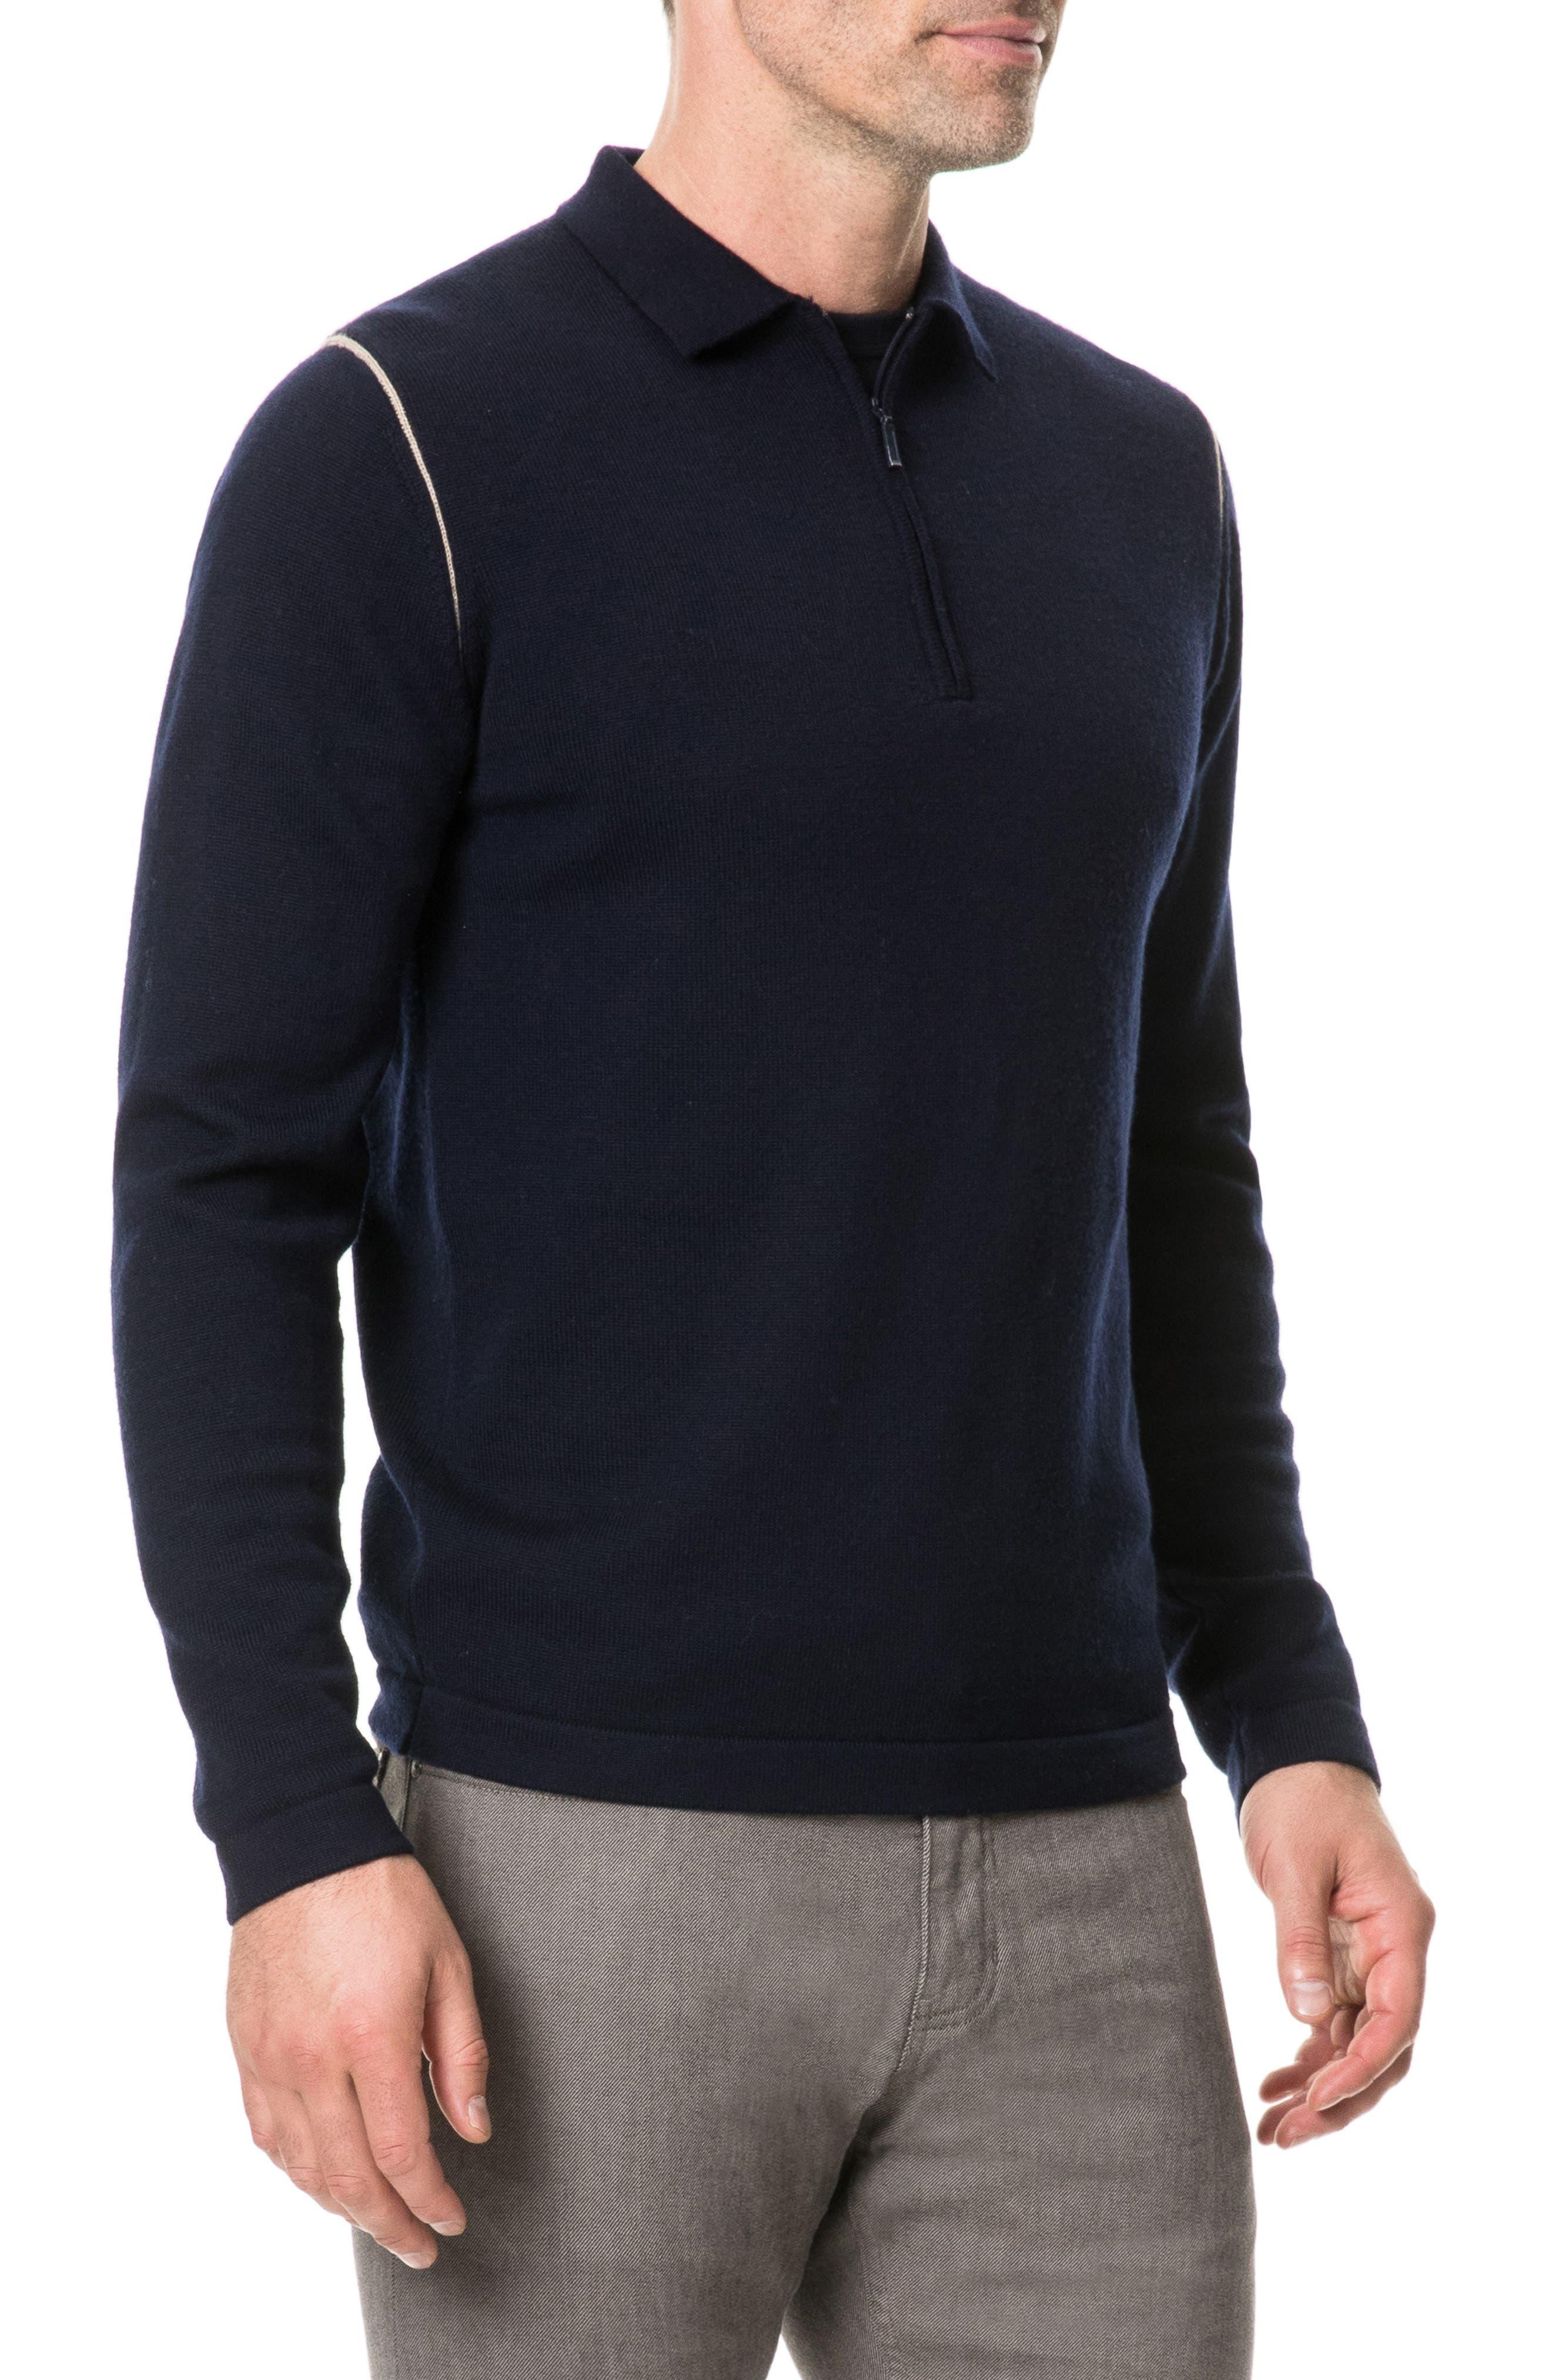 Revill Reserve Merino Wool Zip Polo,                             Alternate thumbnail 3, color,                             MARINE